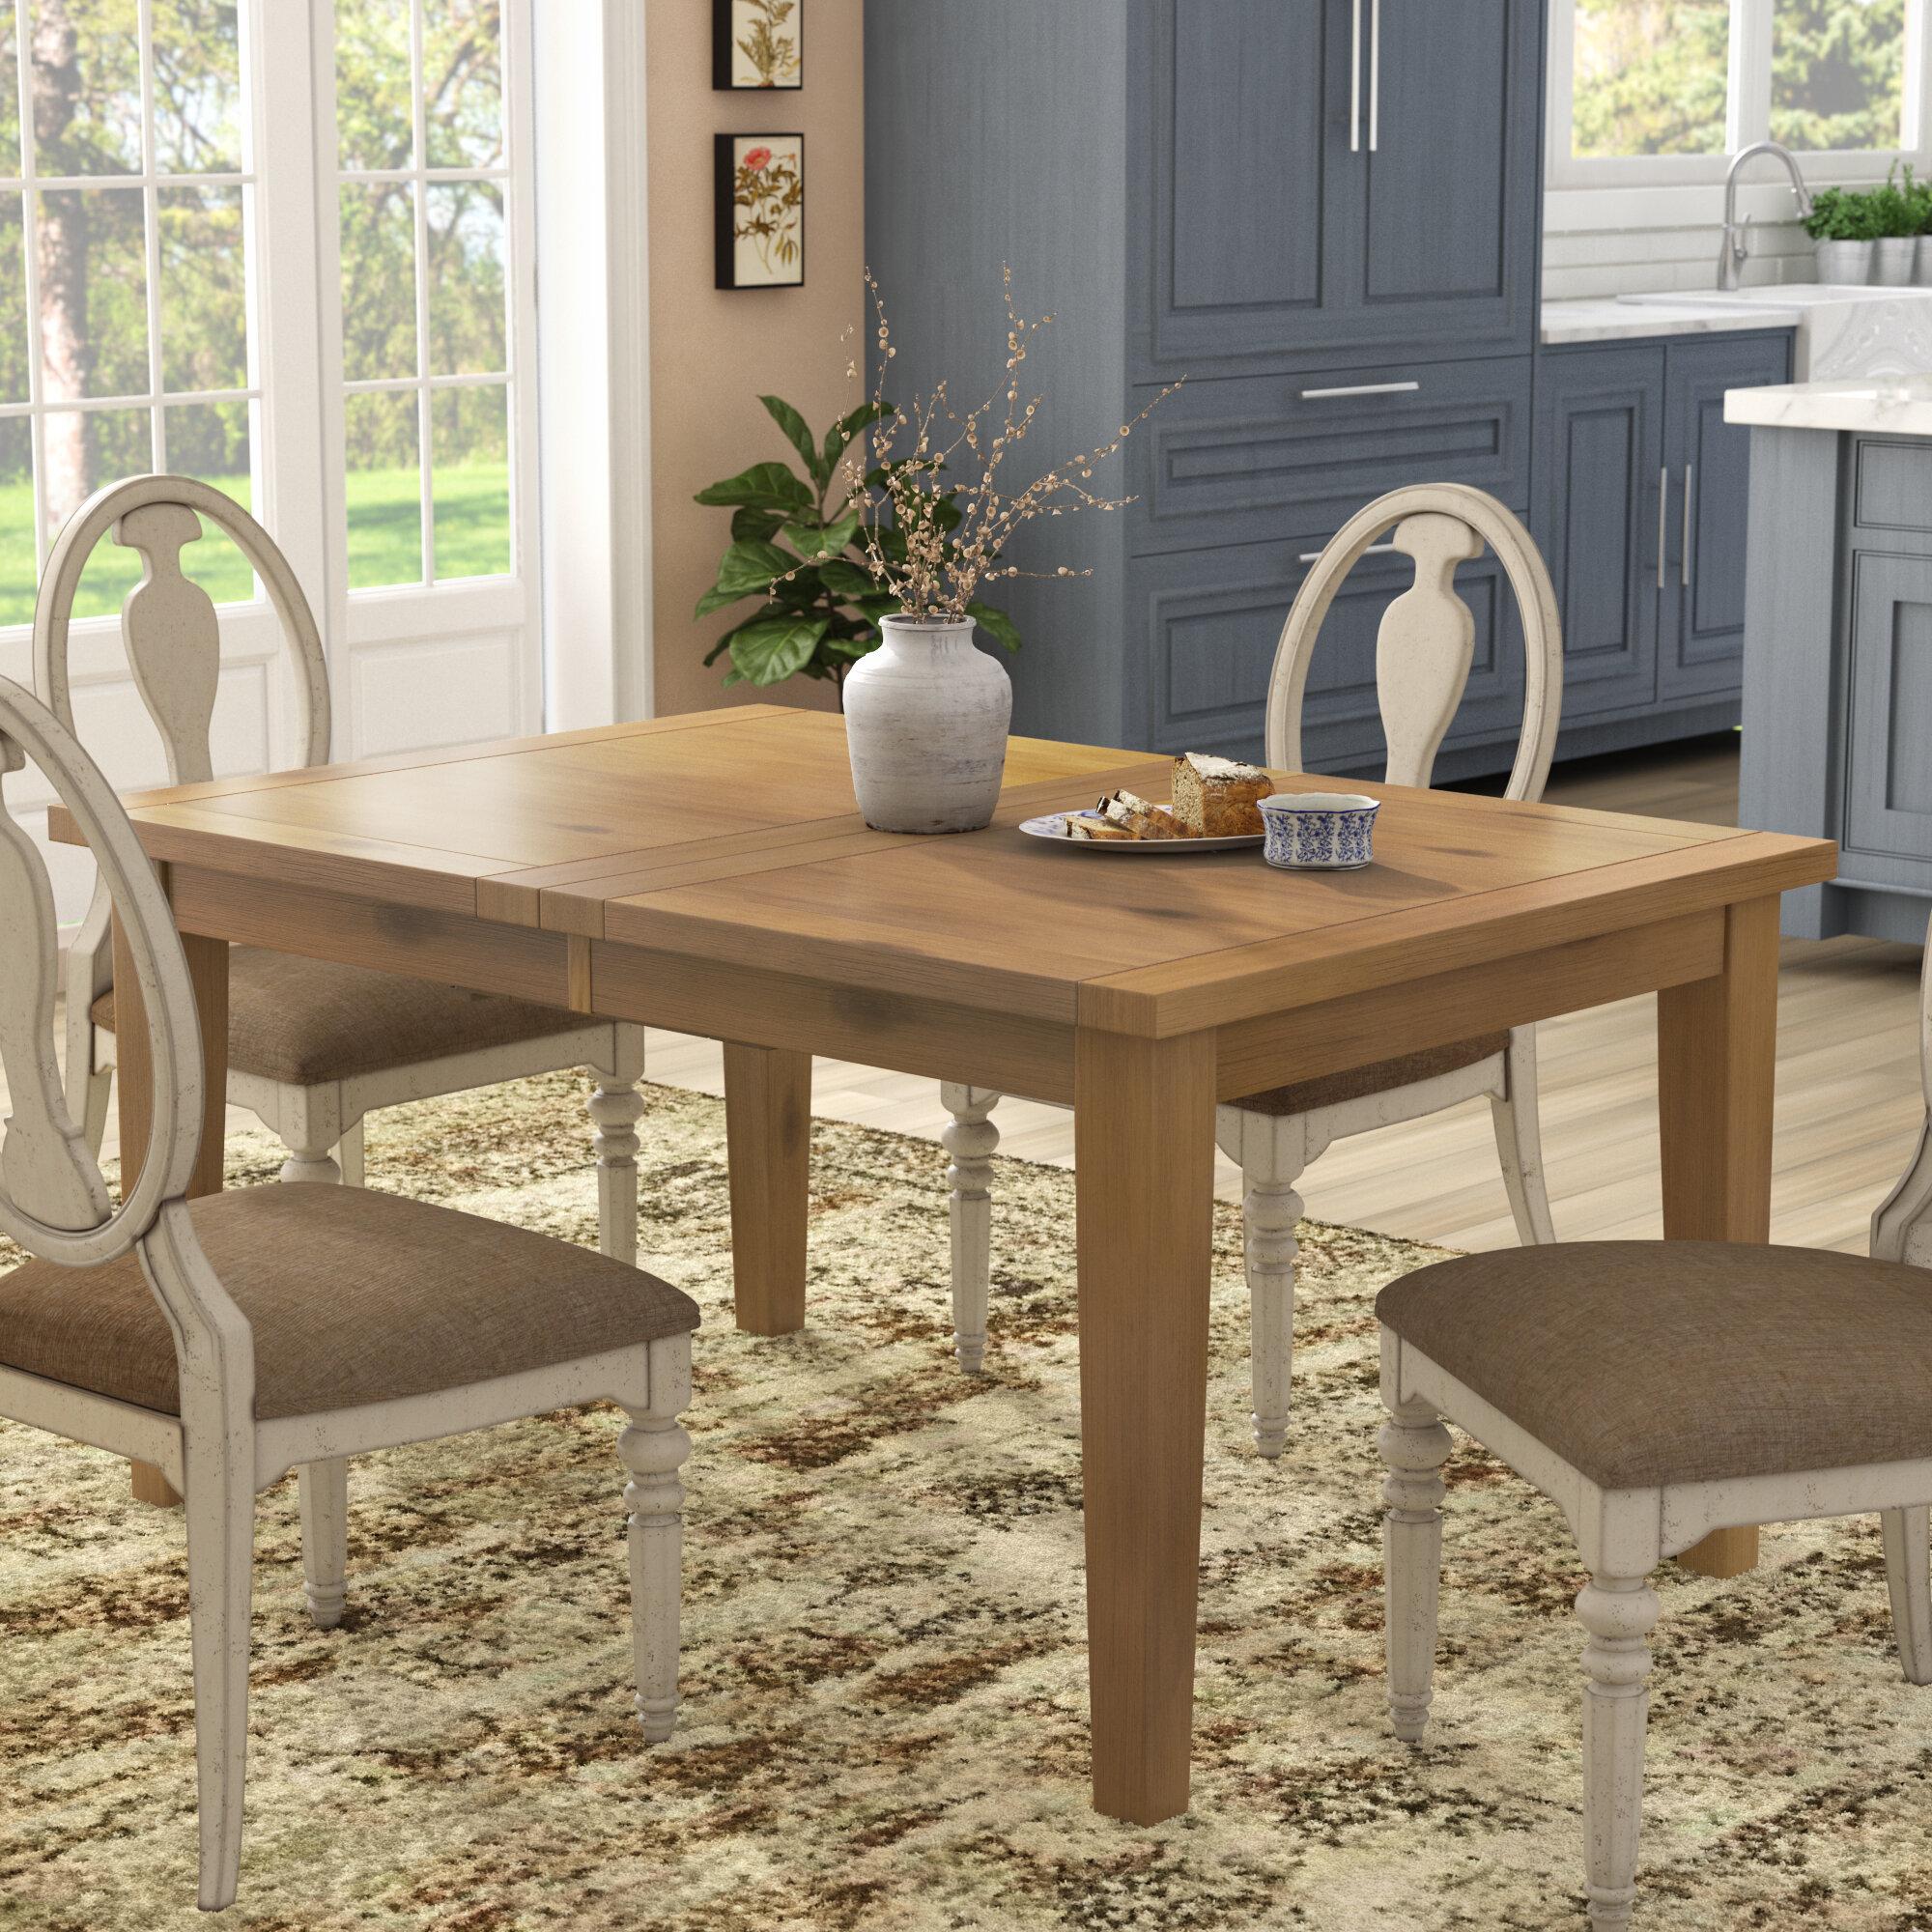 Genial Highland Dunes Centralia Extendable Dining Table U0026 Reviews | Wayfair